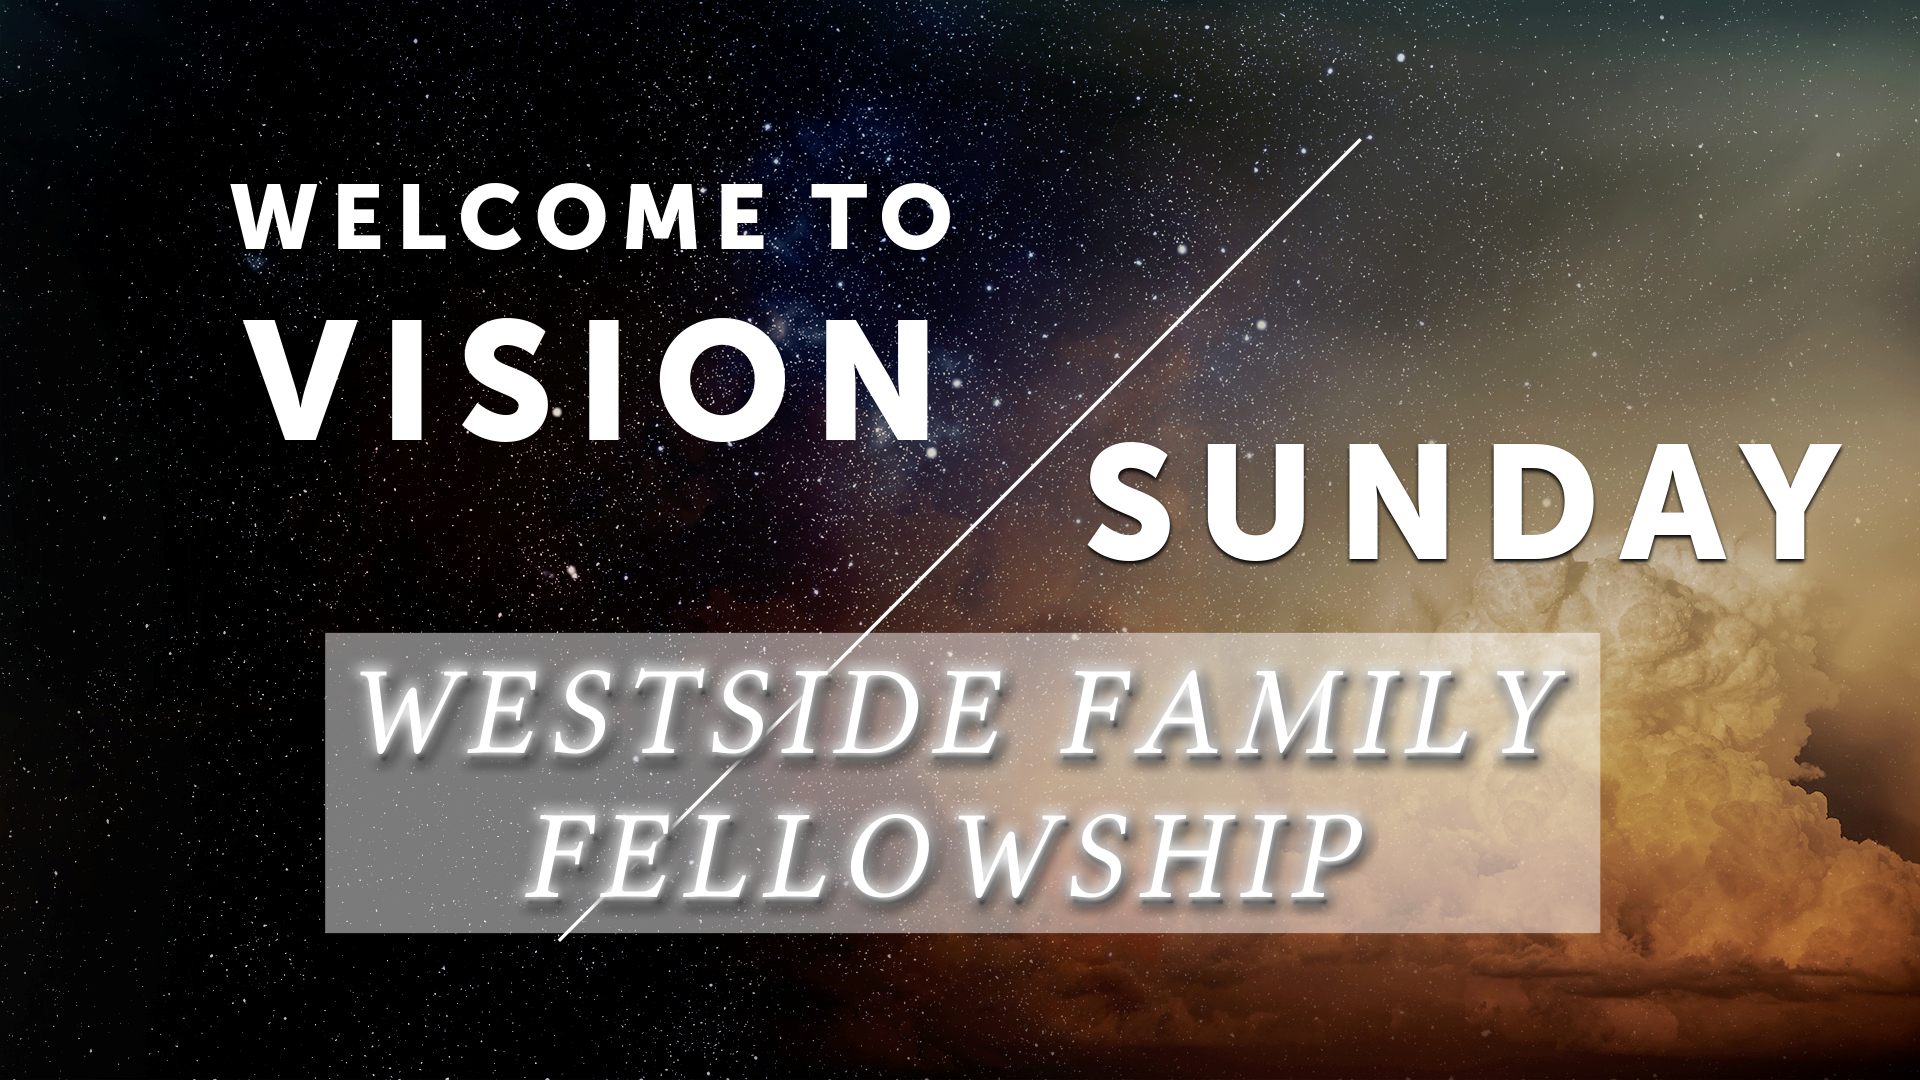 Vision Sunday - Part 1